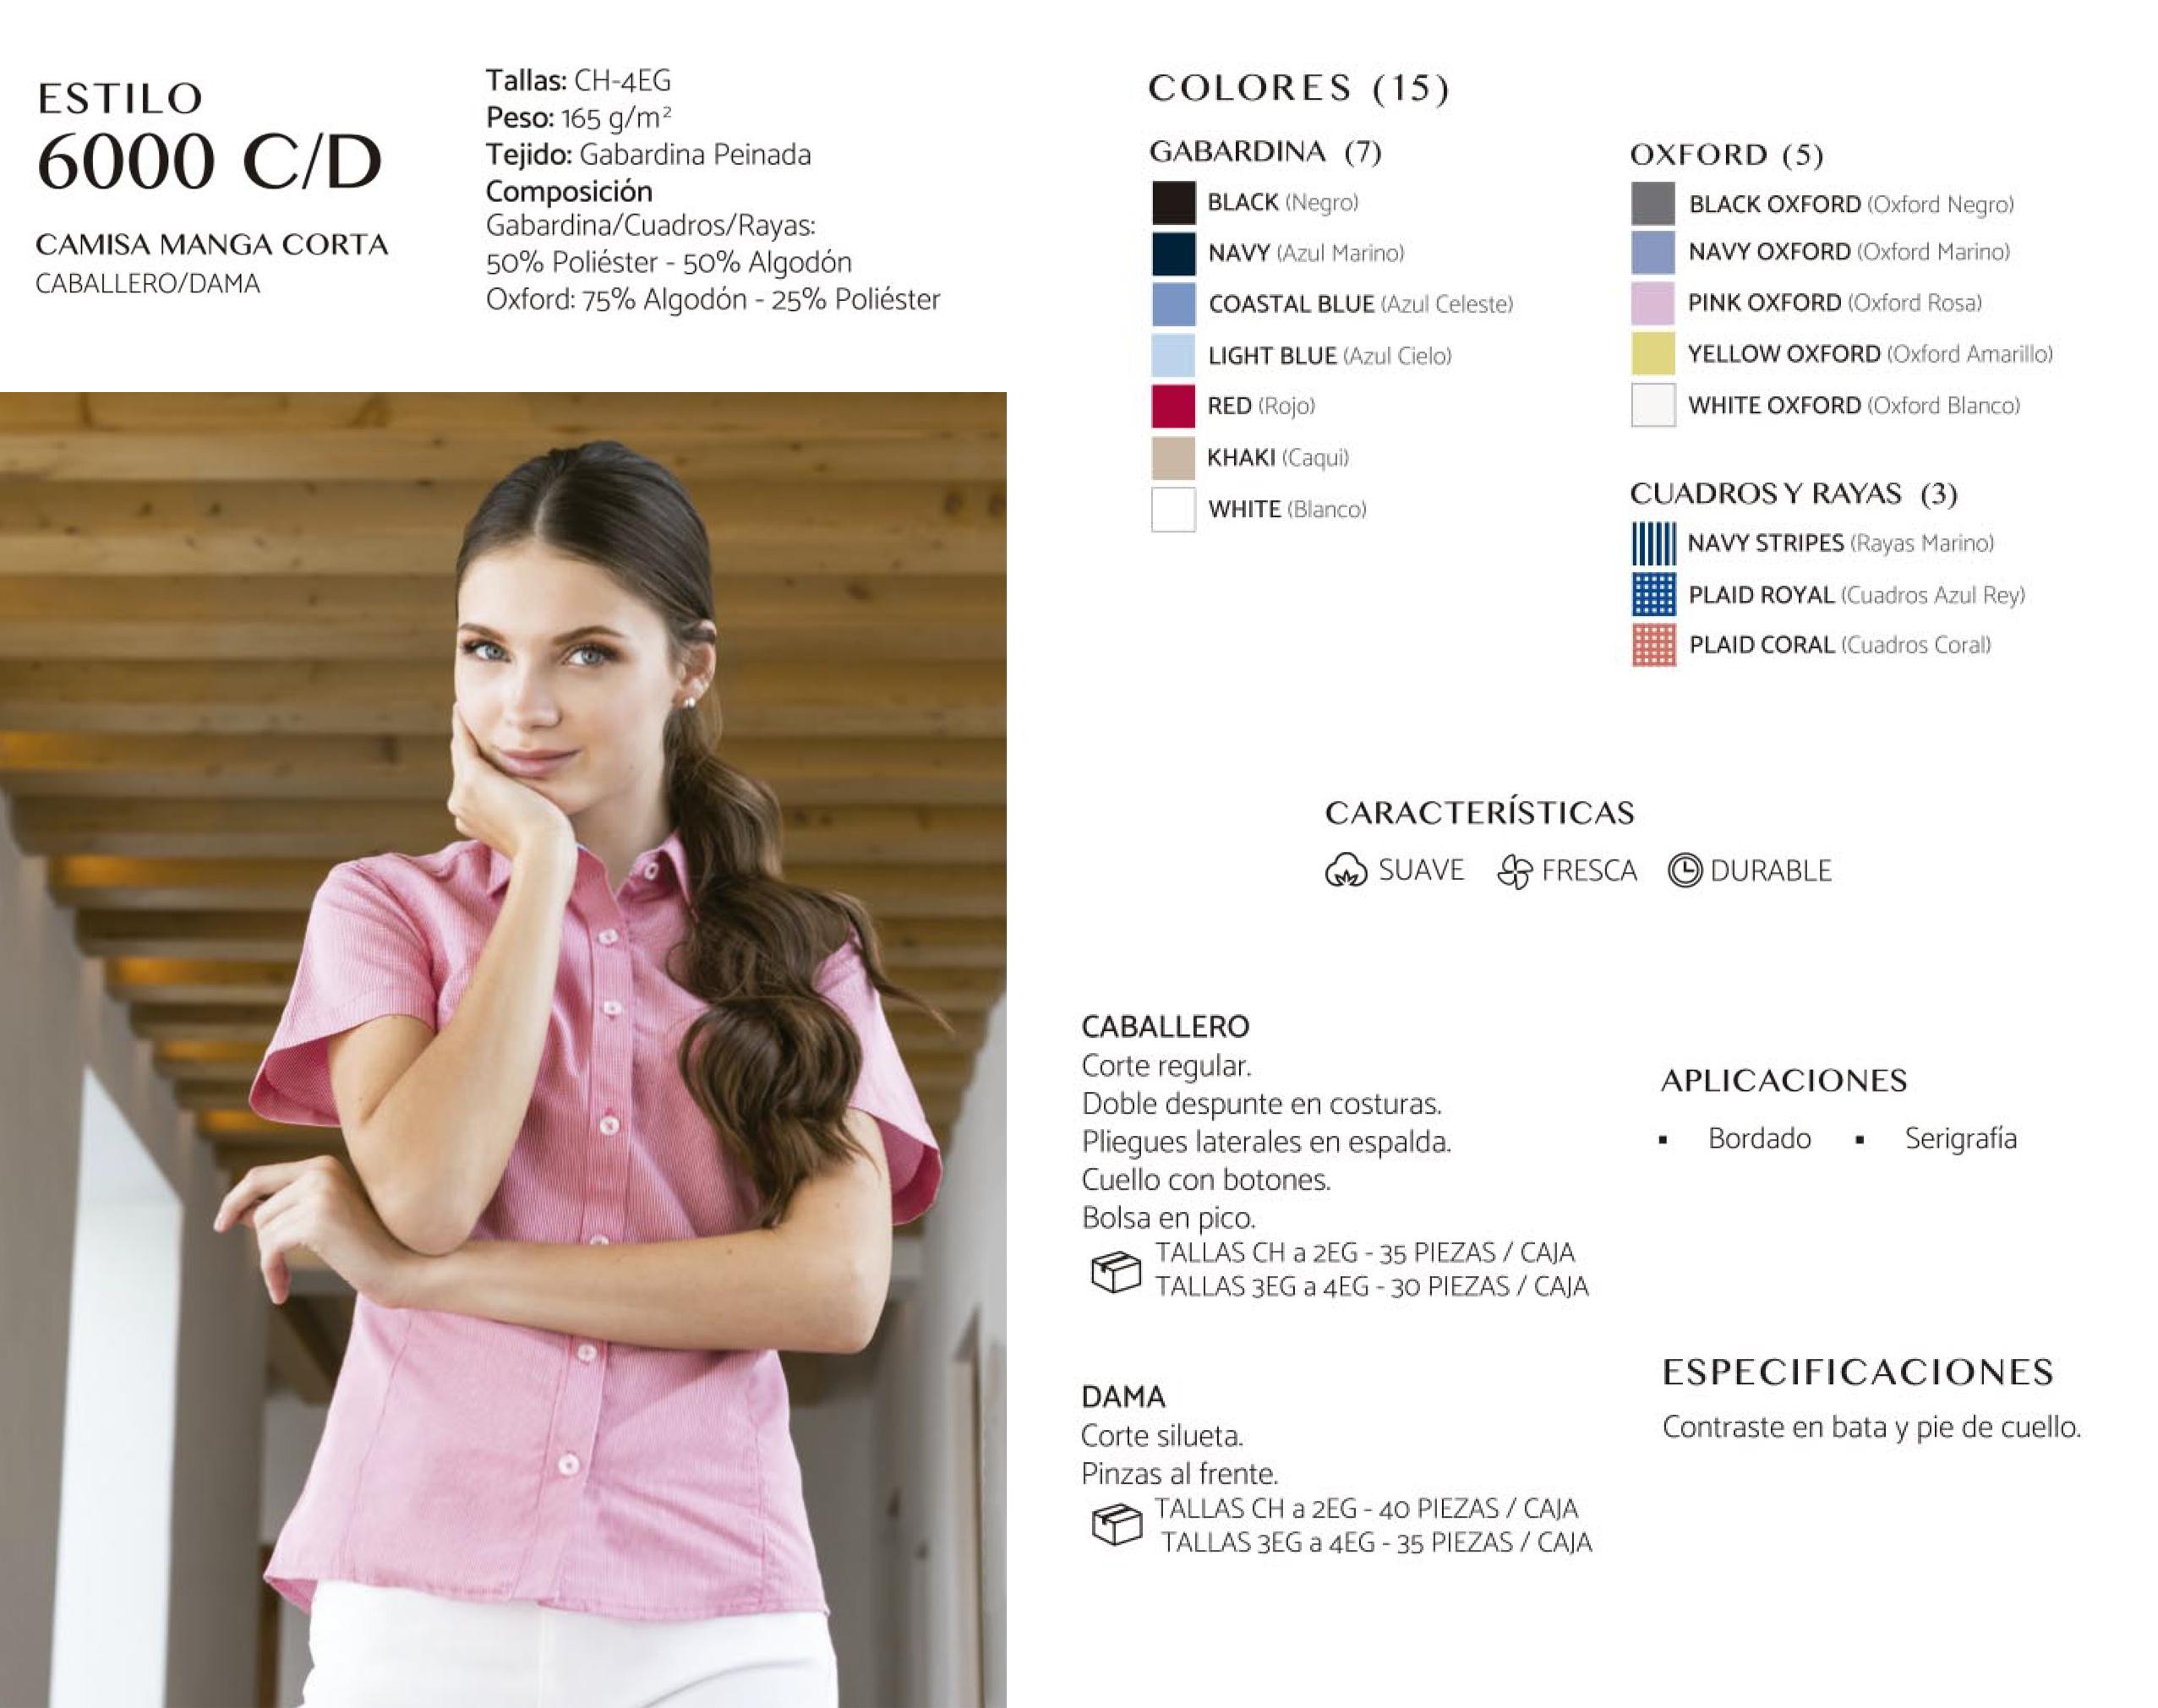 Camisa  Manga Corta 6000 C/D